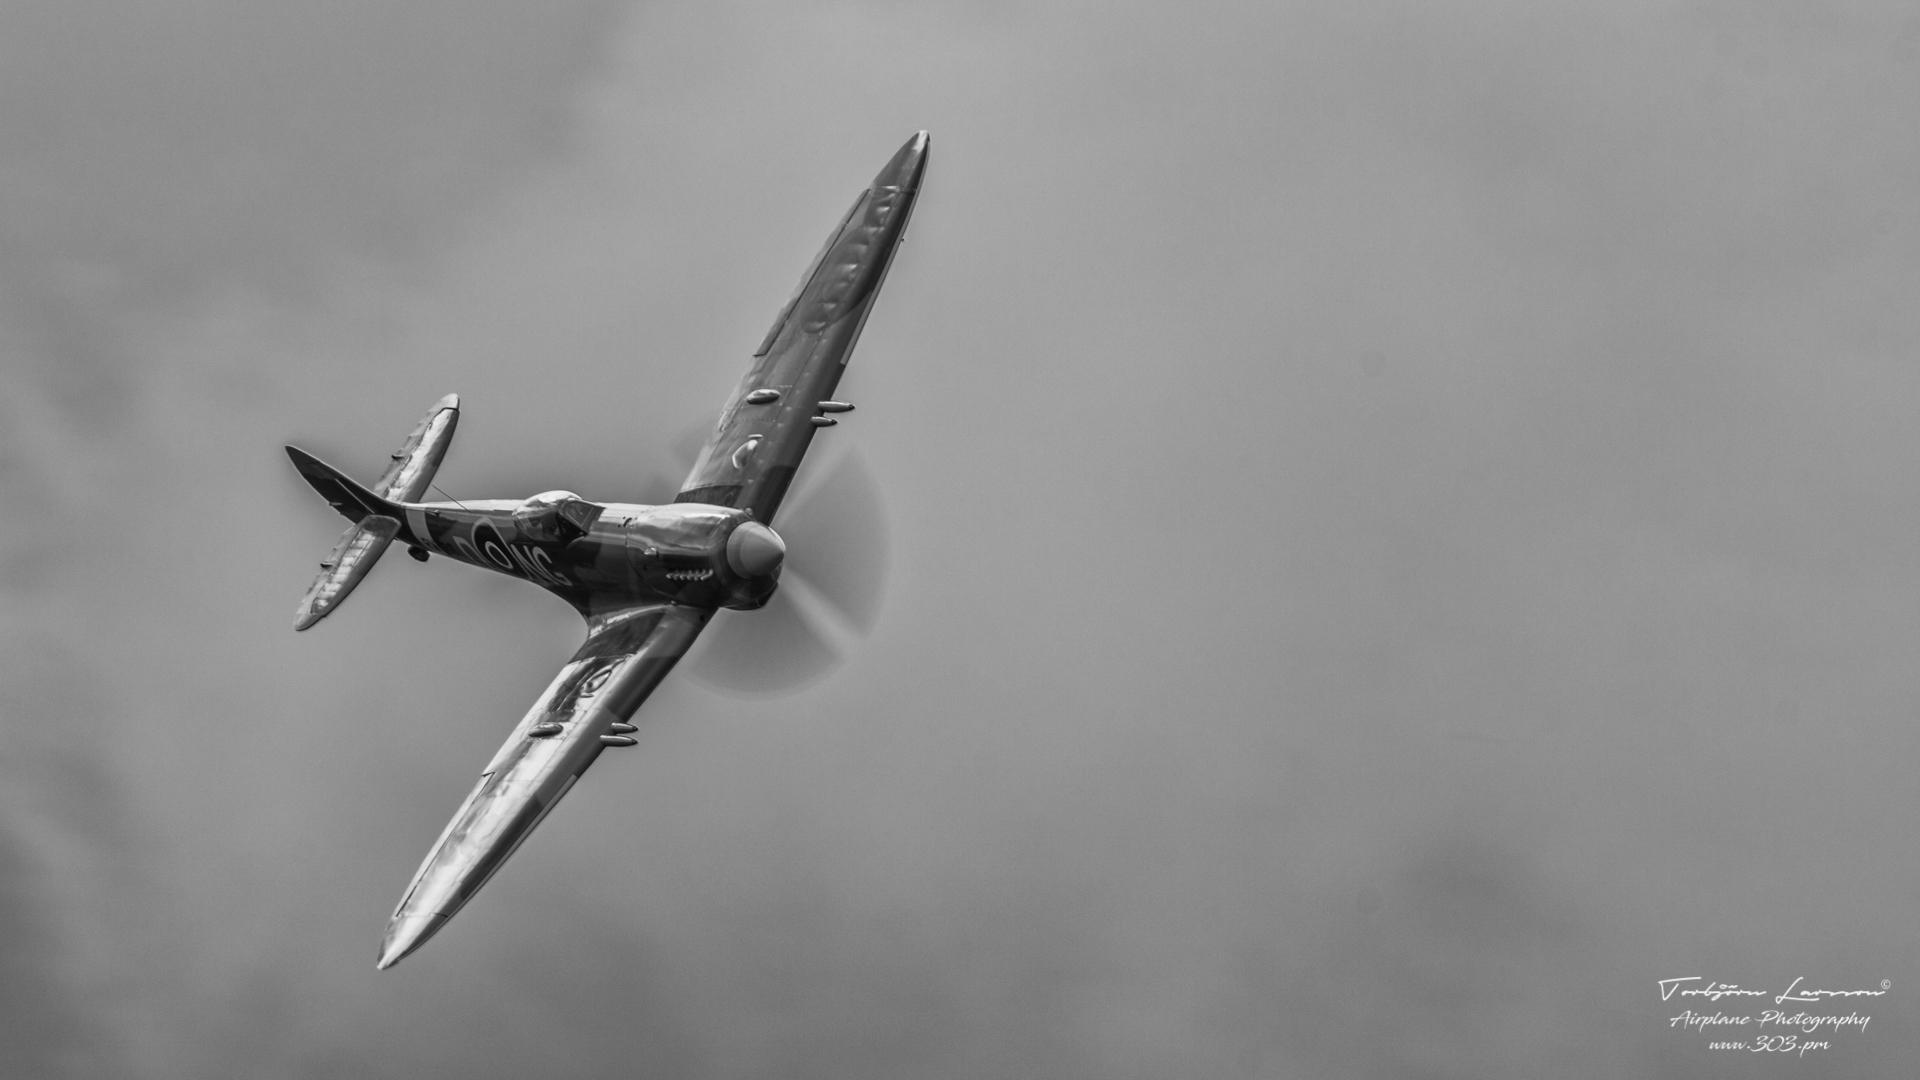 TBE_0786-Supermarine Spitfire-LF.XVI (SE-BIR)